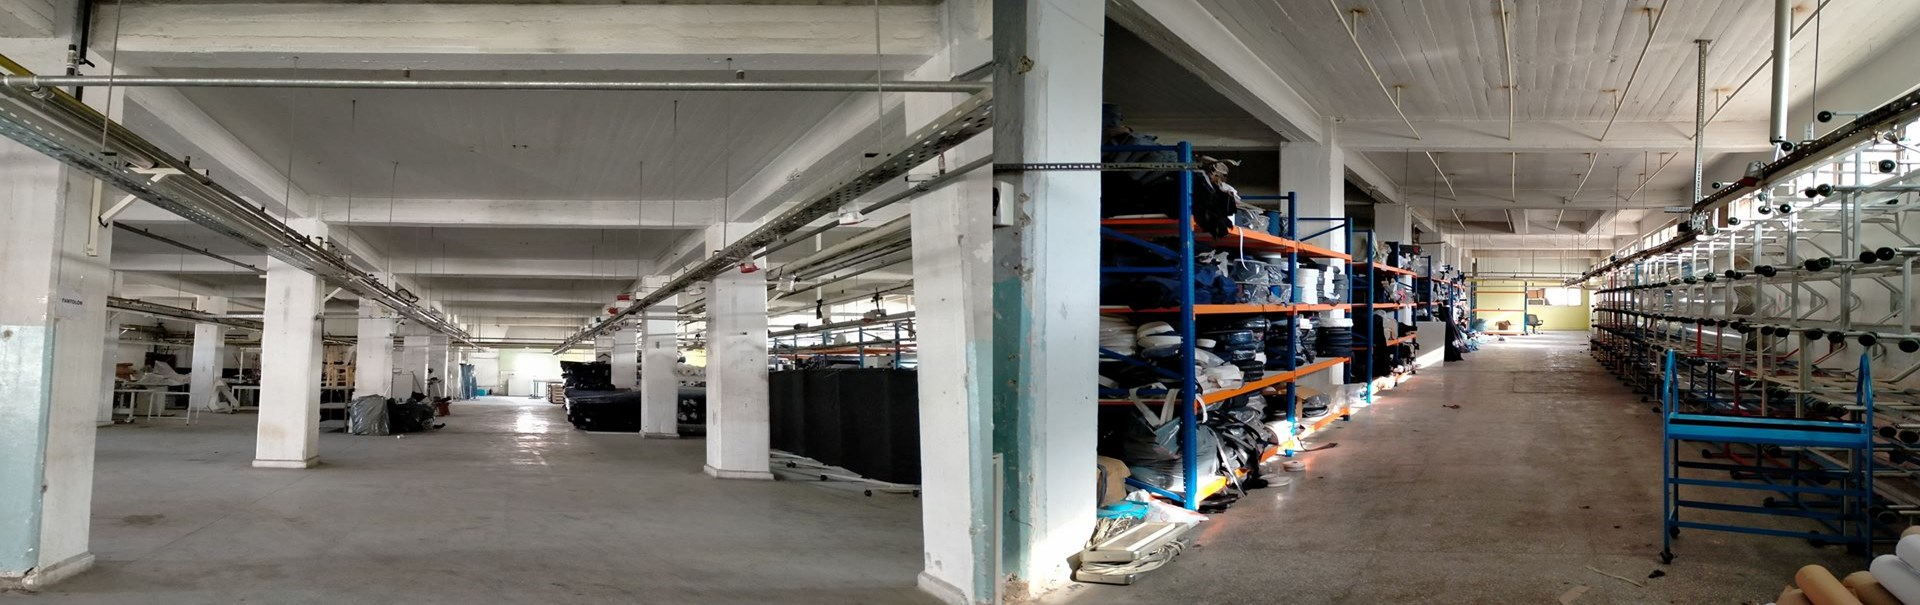 Konak Zeytinlik'te 6.000 m2 Kiralık Bina